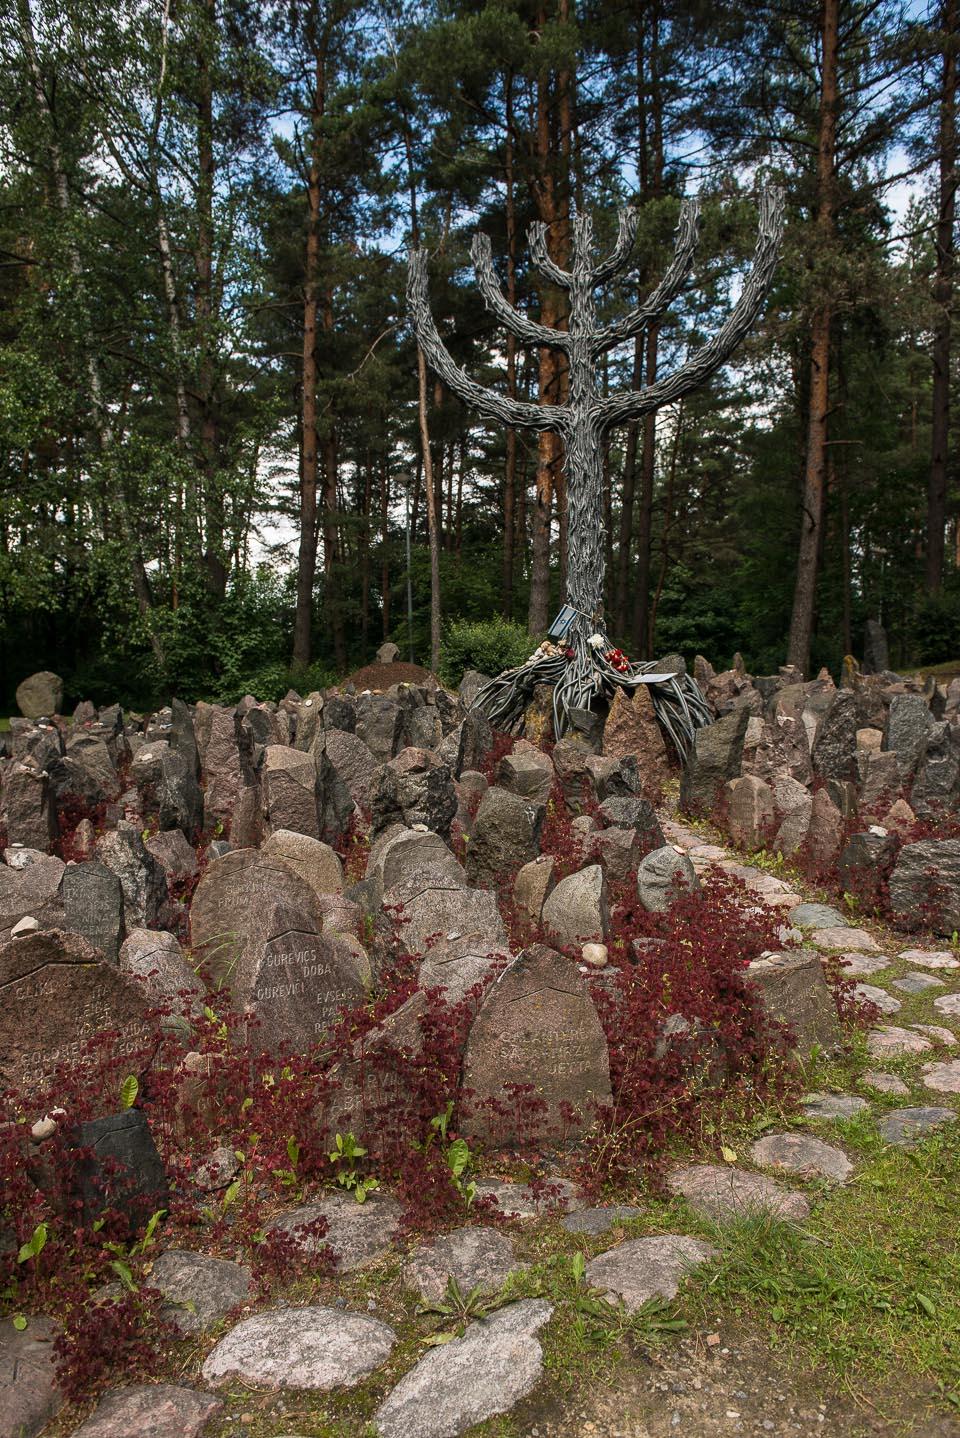 rumbula massacre latvia sculpture holocaust memorial